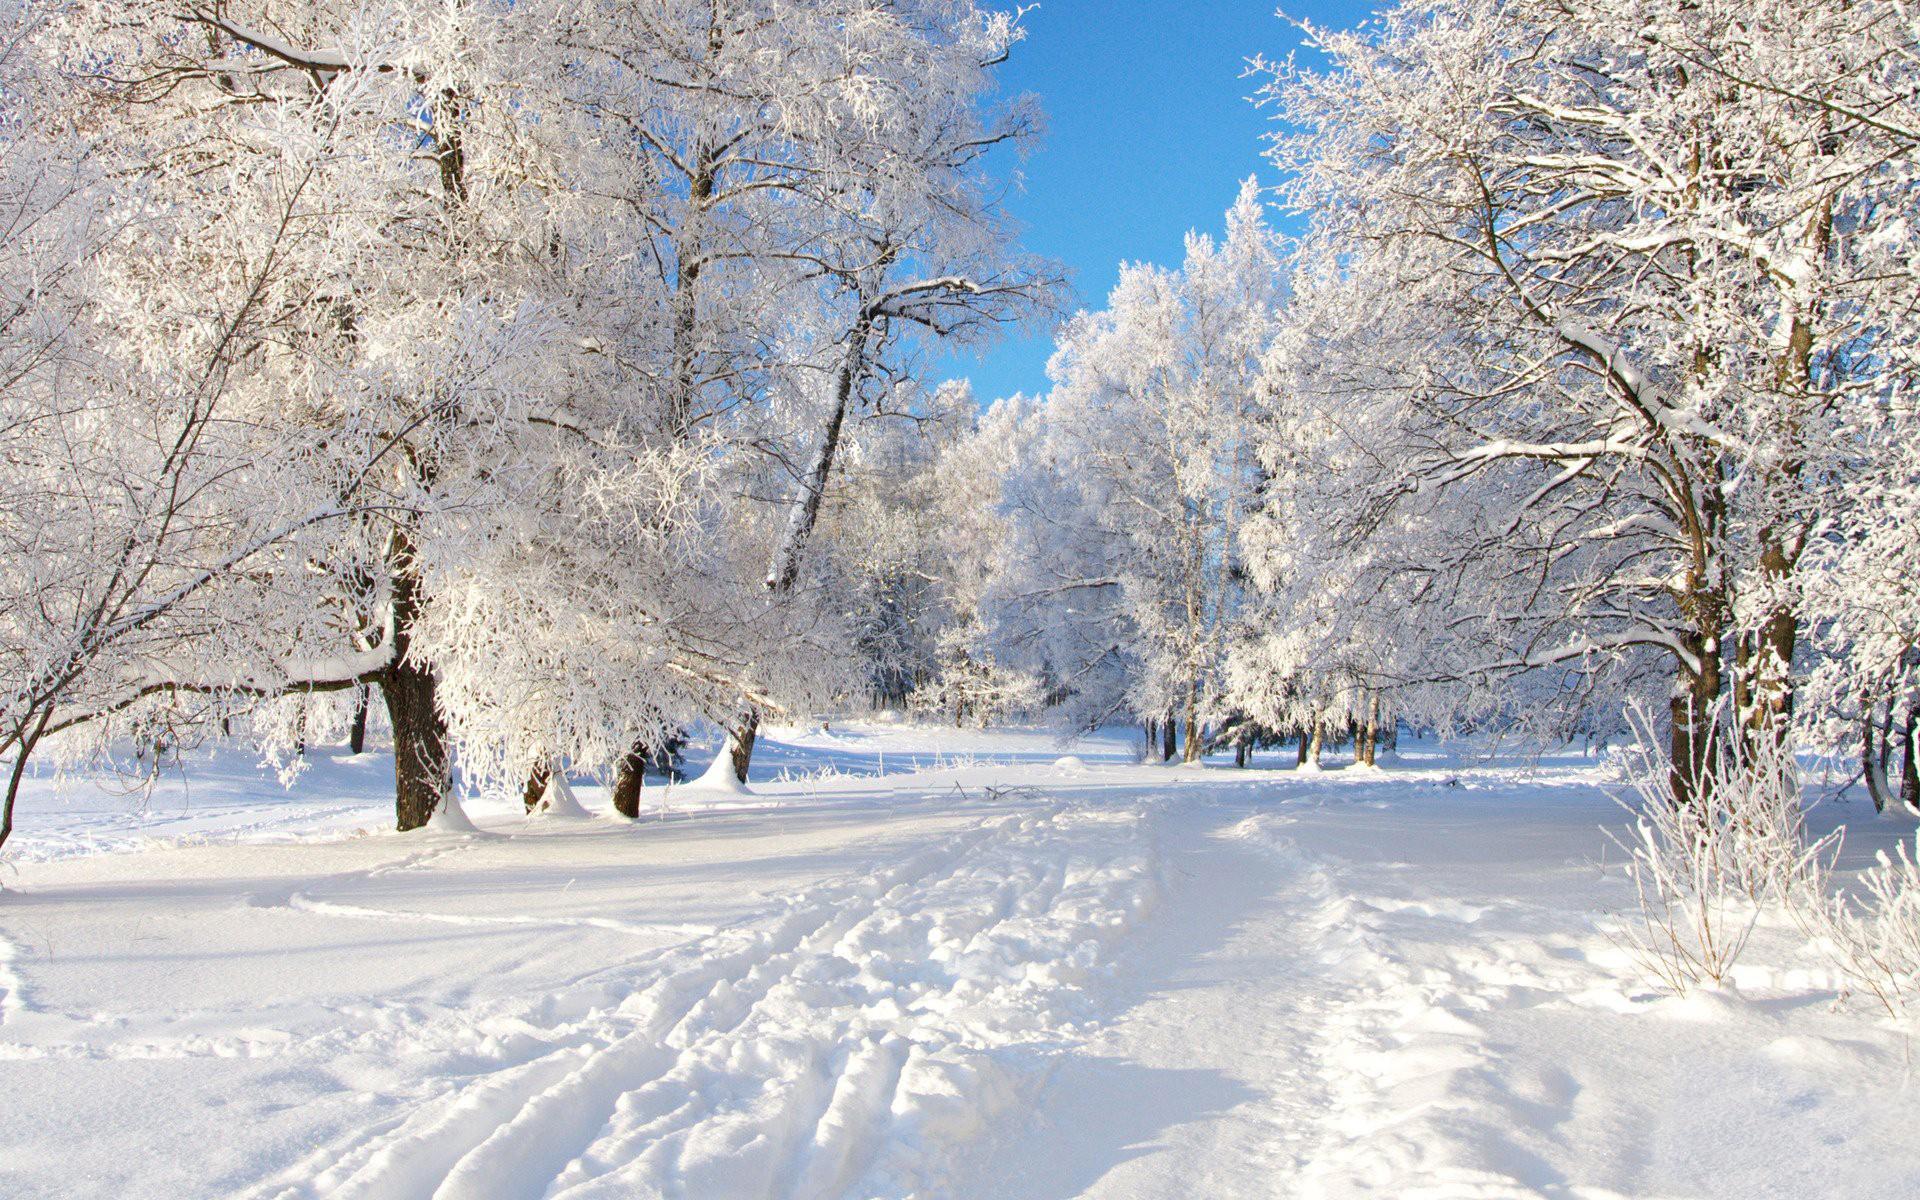 View Free Desktop Wallpaper Winter Desktop Wallpaper Winter Desktop Wallpaper Winter ...